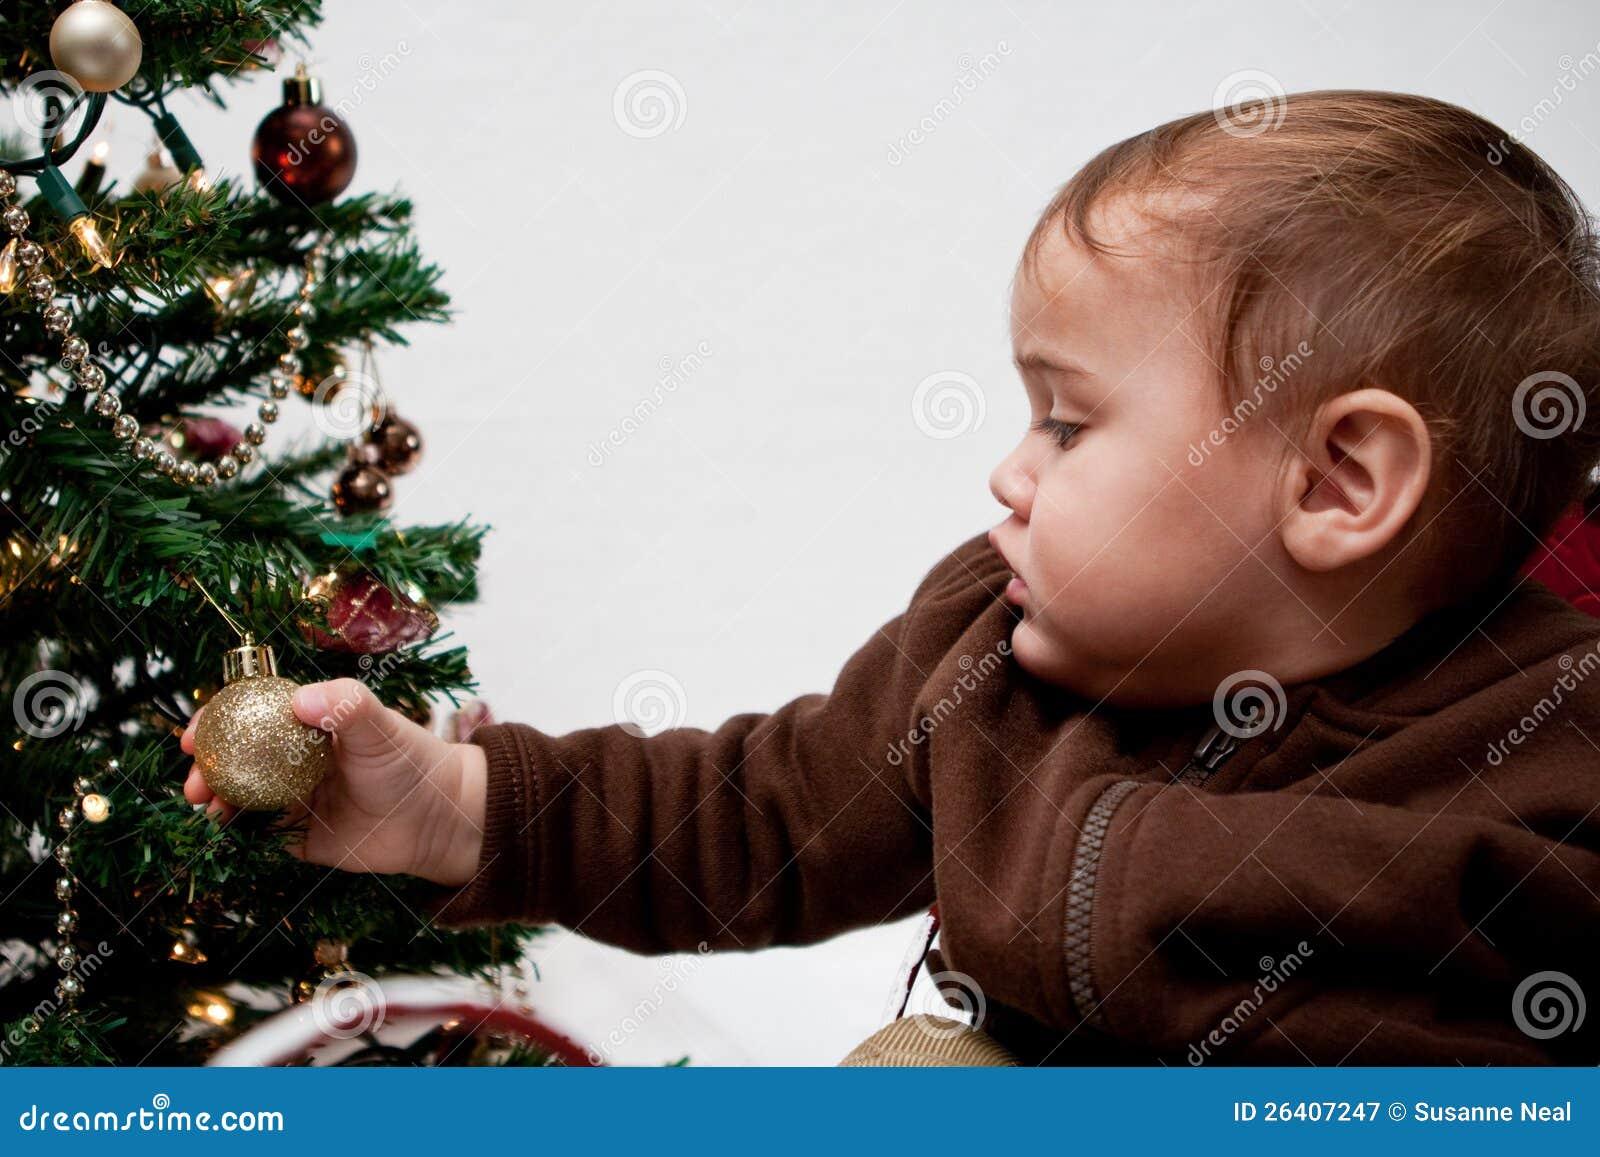 Baby boy christmas ornaments - Baby Boy Holding Christmas Ornament On Tree